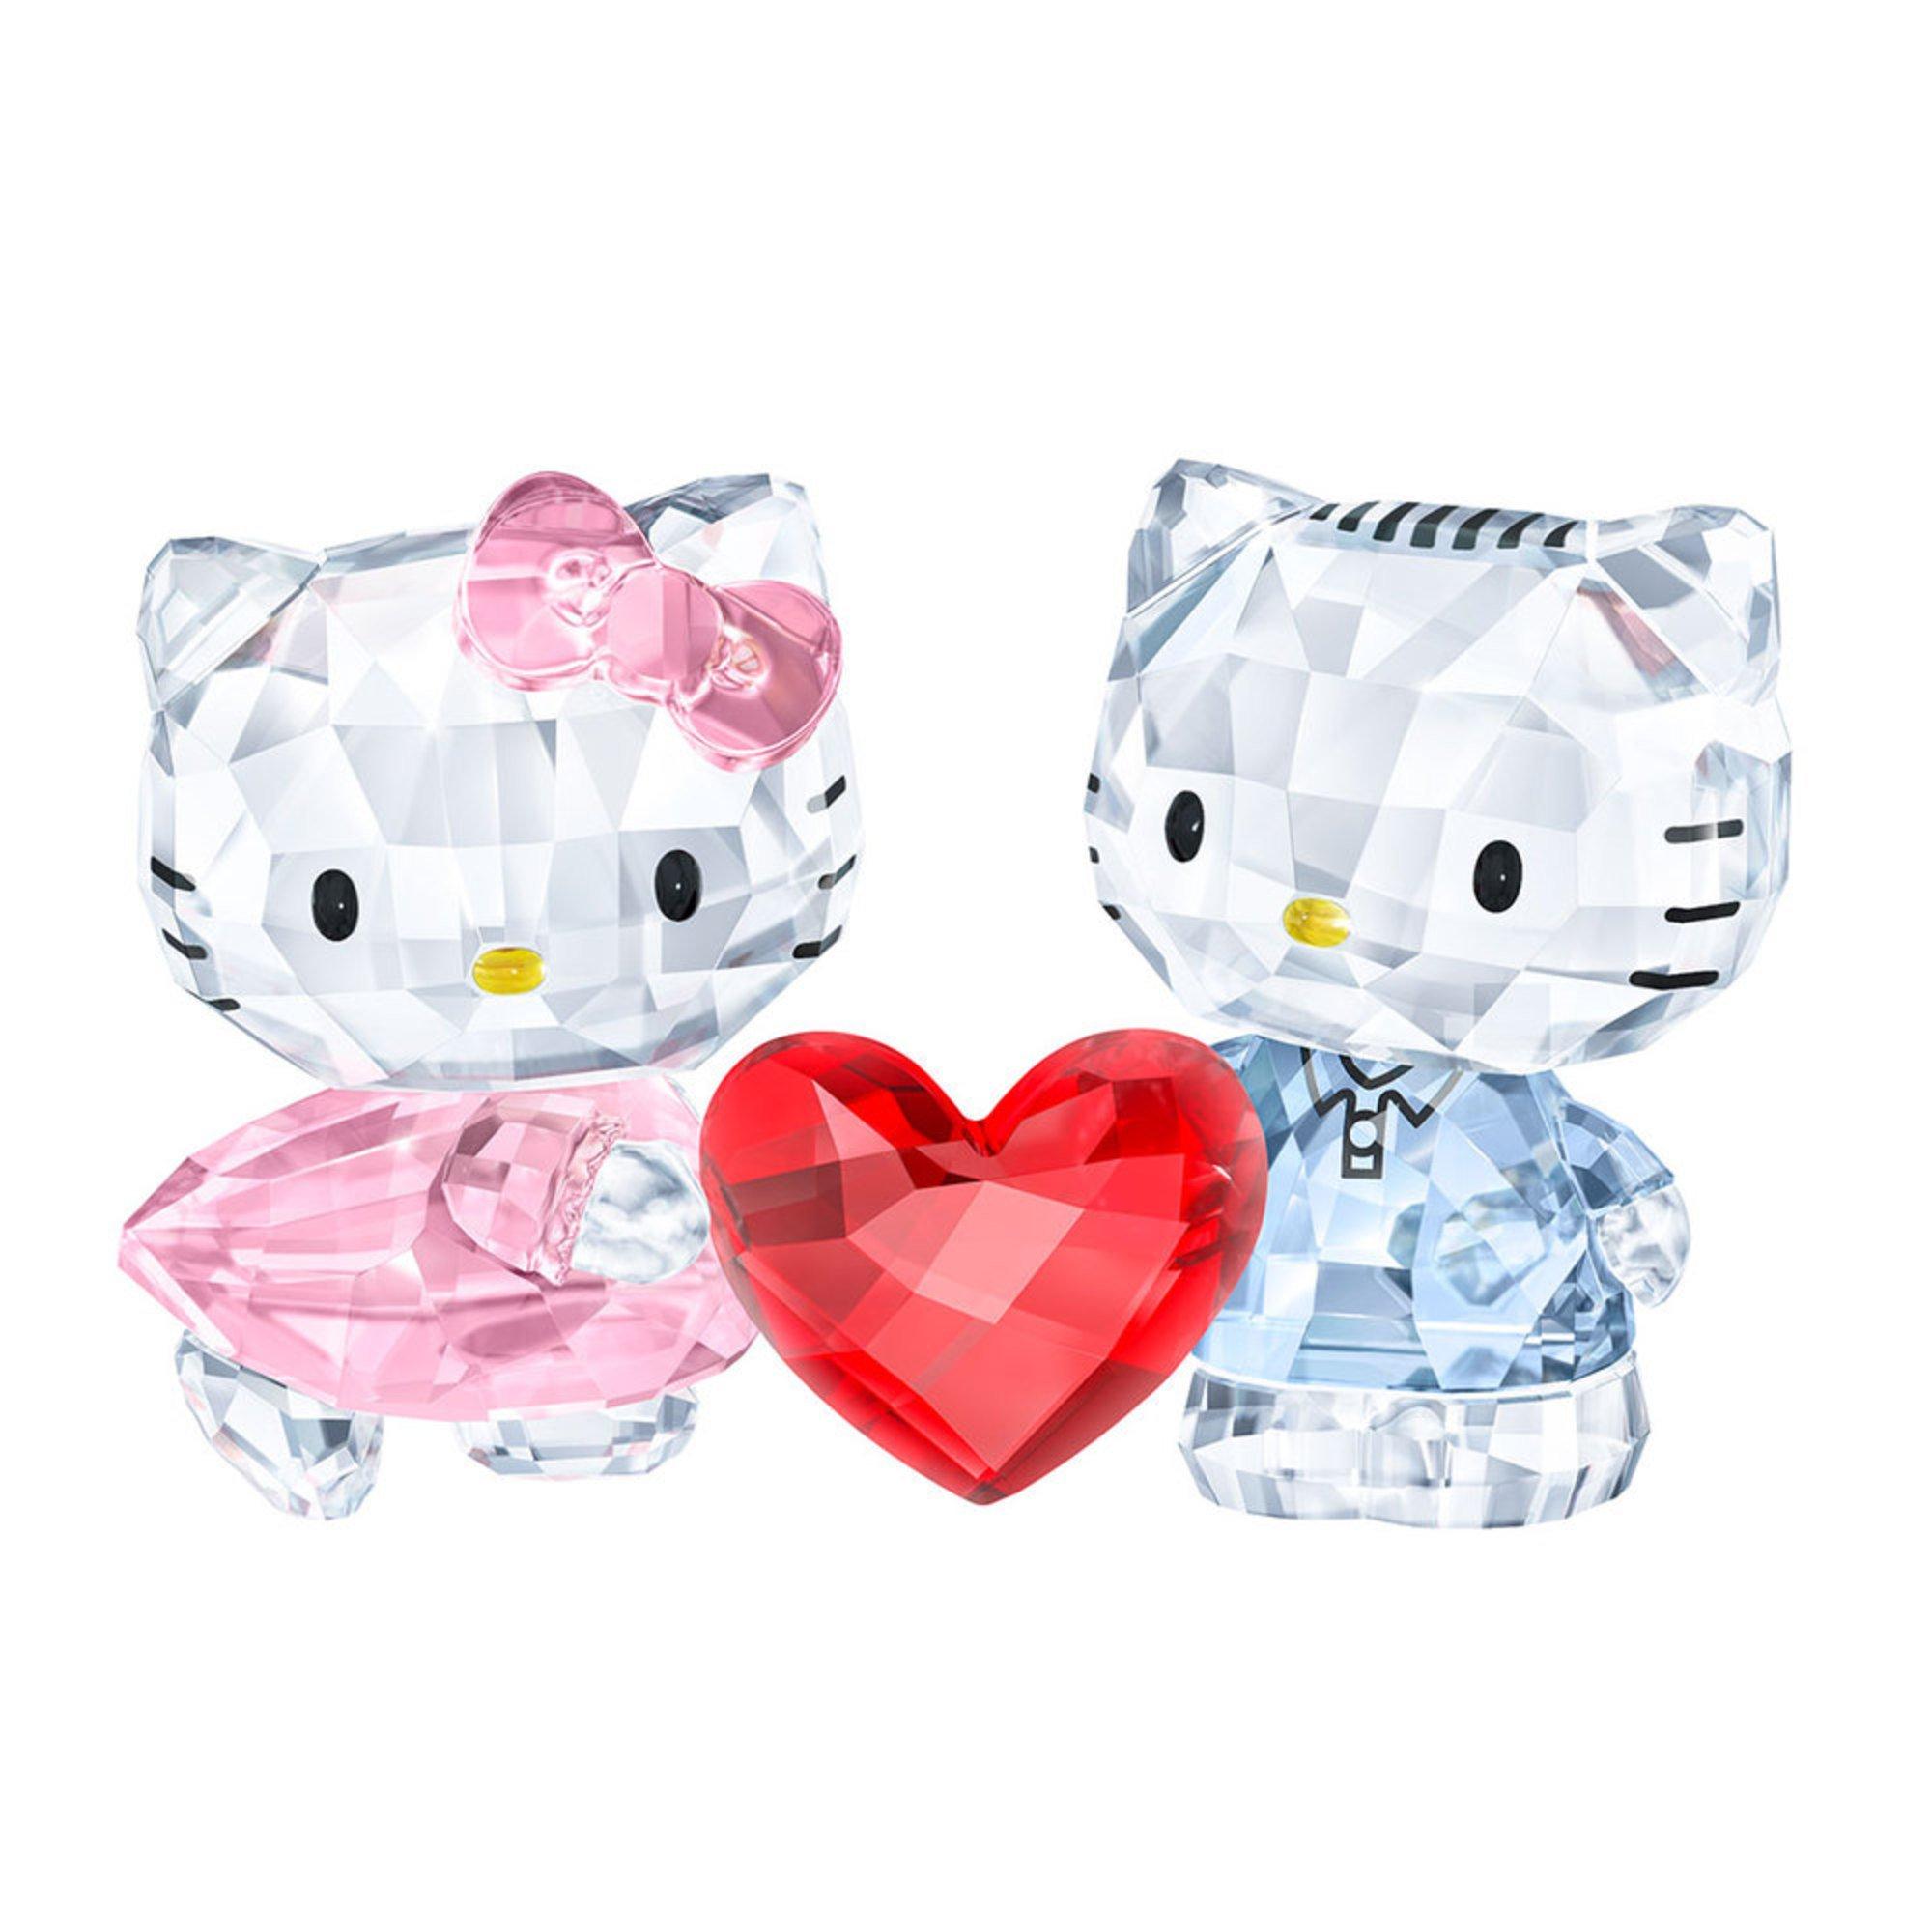 2de9d8e43fa3 Swarovski Crystal Living Hello Kitty And Dear Daniel